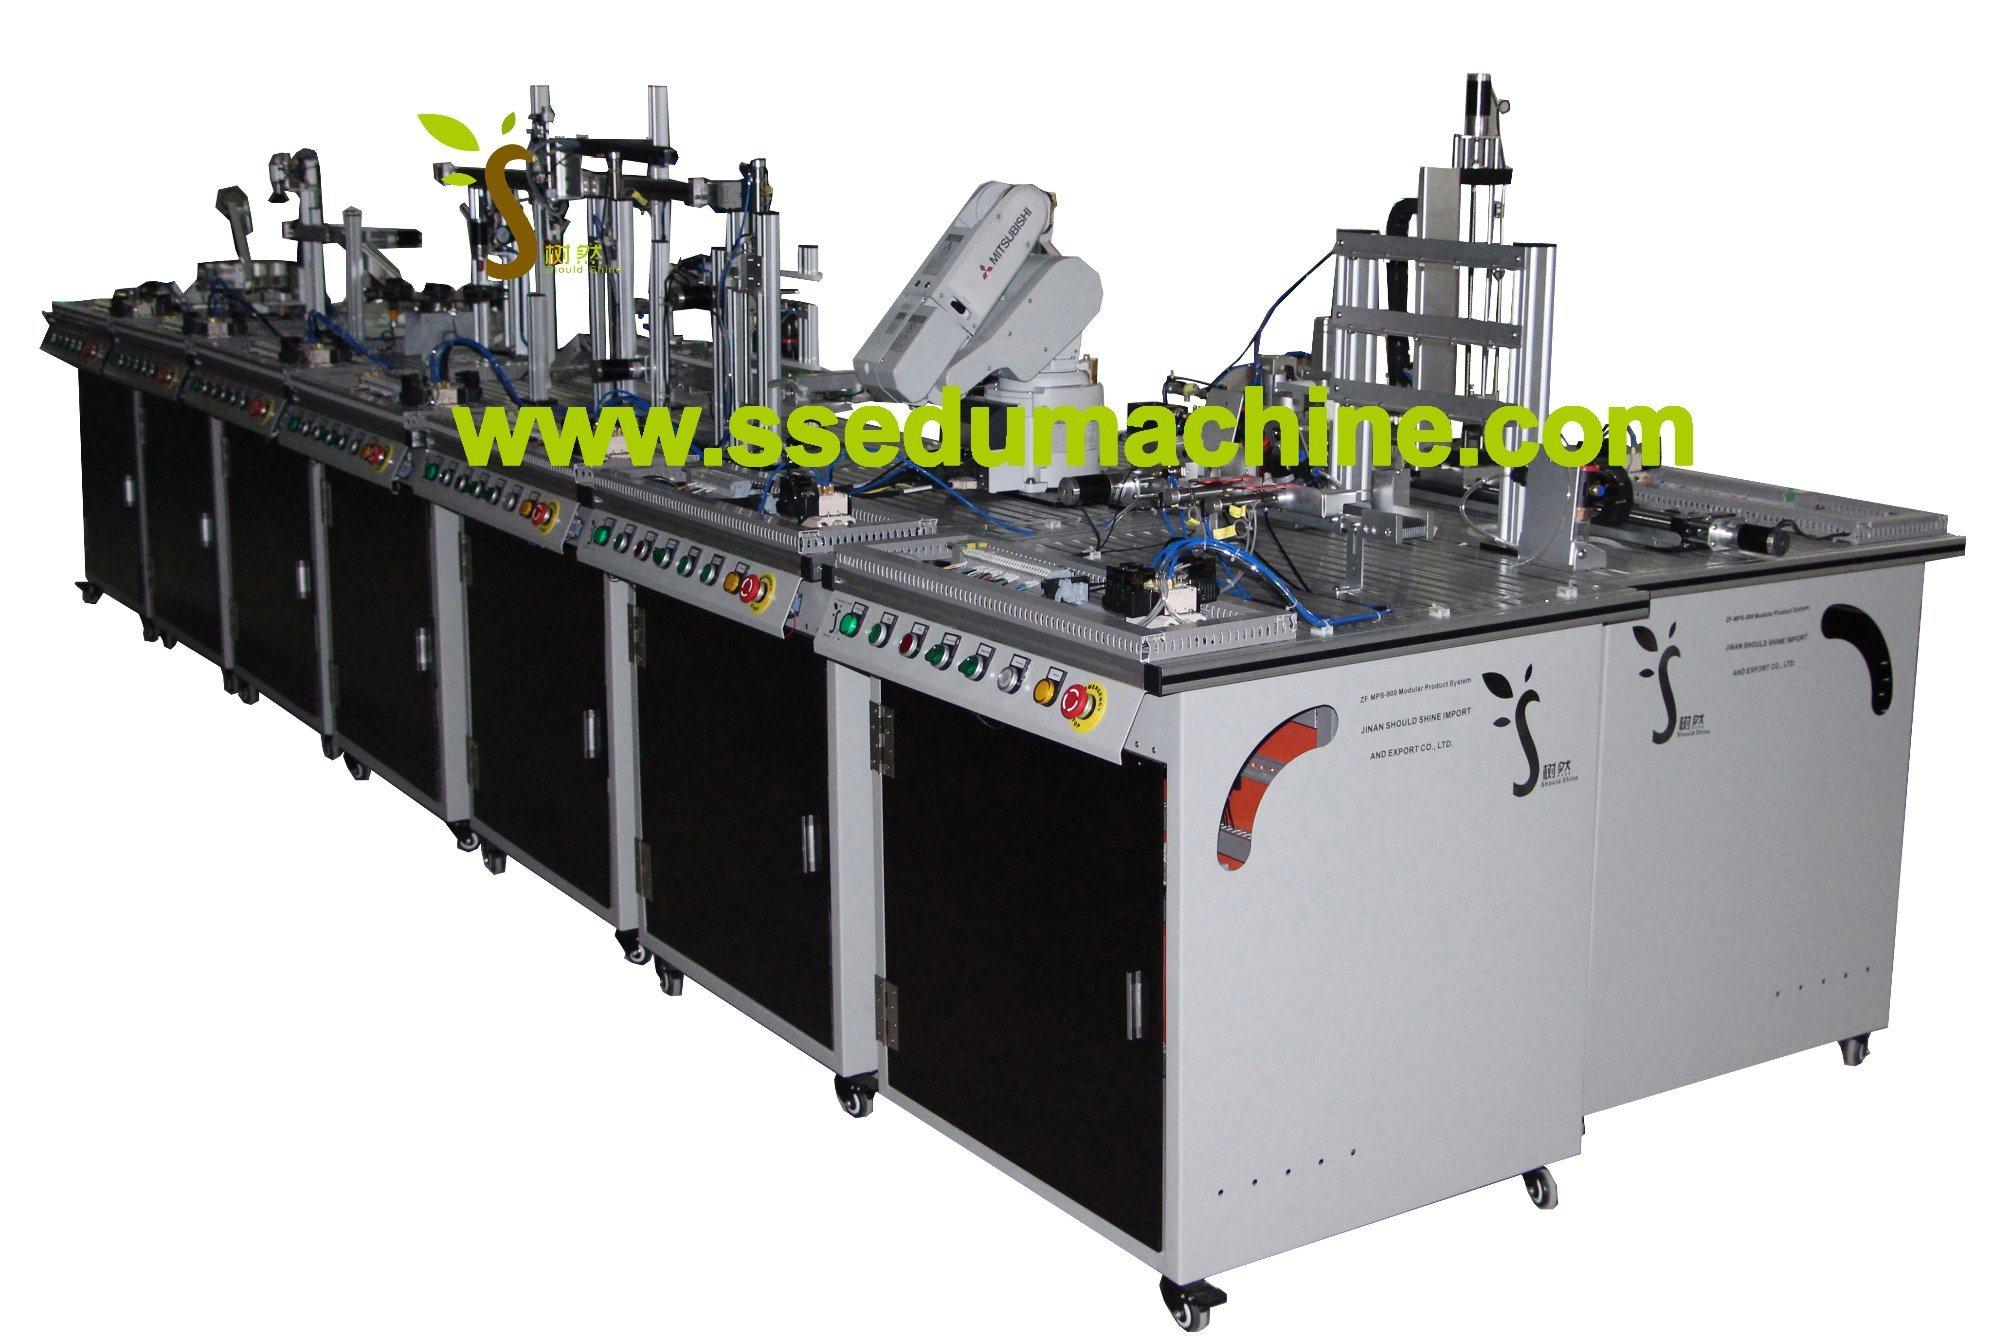 Flexible Manufacture System Mechatronics Training Equipment Mechatronics Trainer Mps